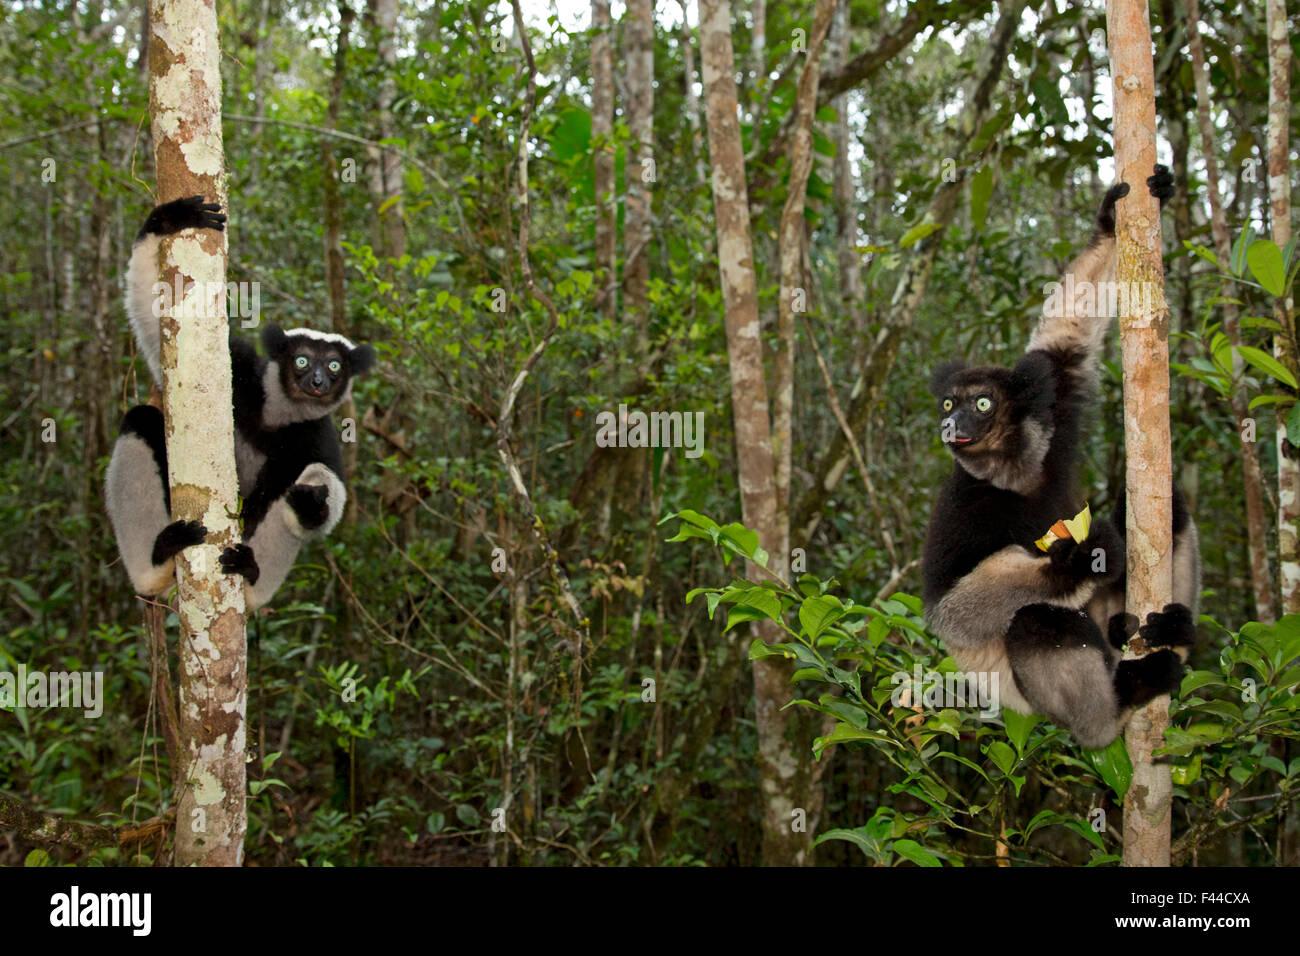 Indri (Indri indri) on trees in tropical rainforest habitat. Madagascar. - Stock Image